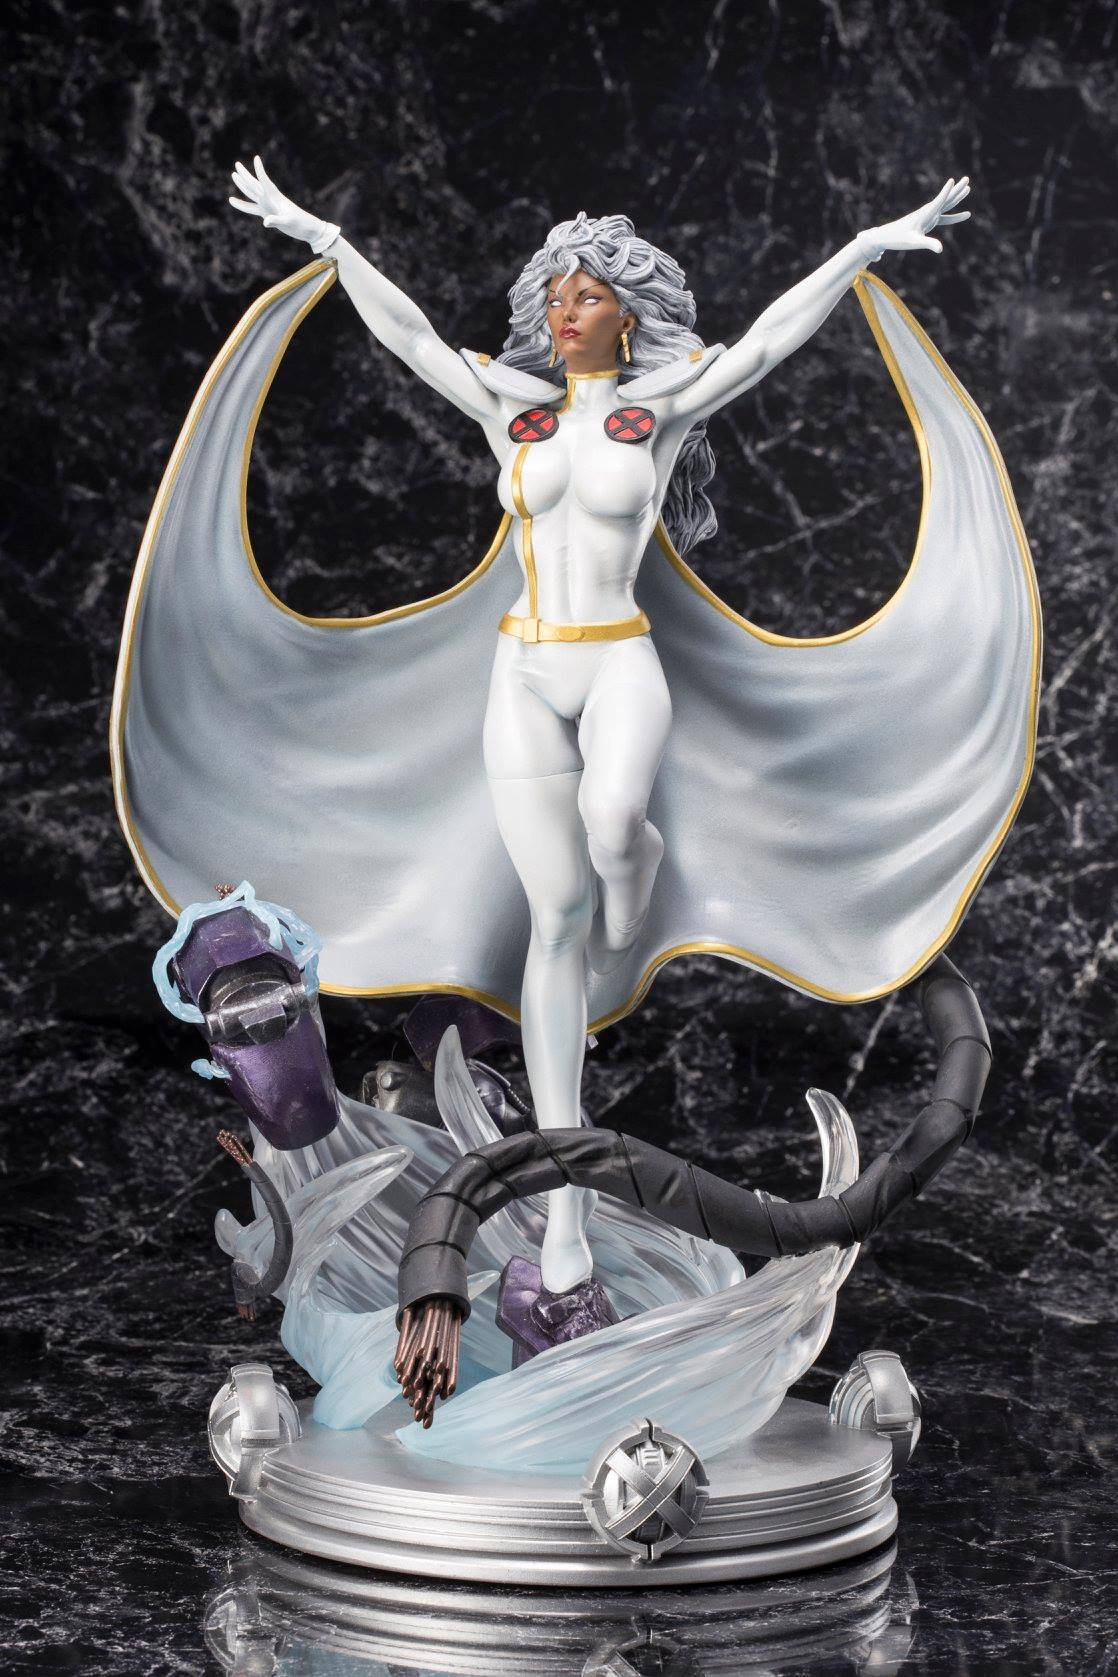 Kotobukiya Storm X-Men Danger Room Sessions Statue Up for ...